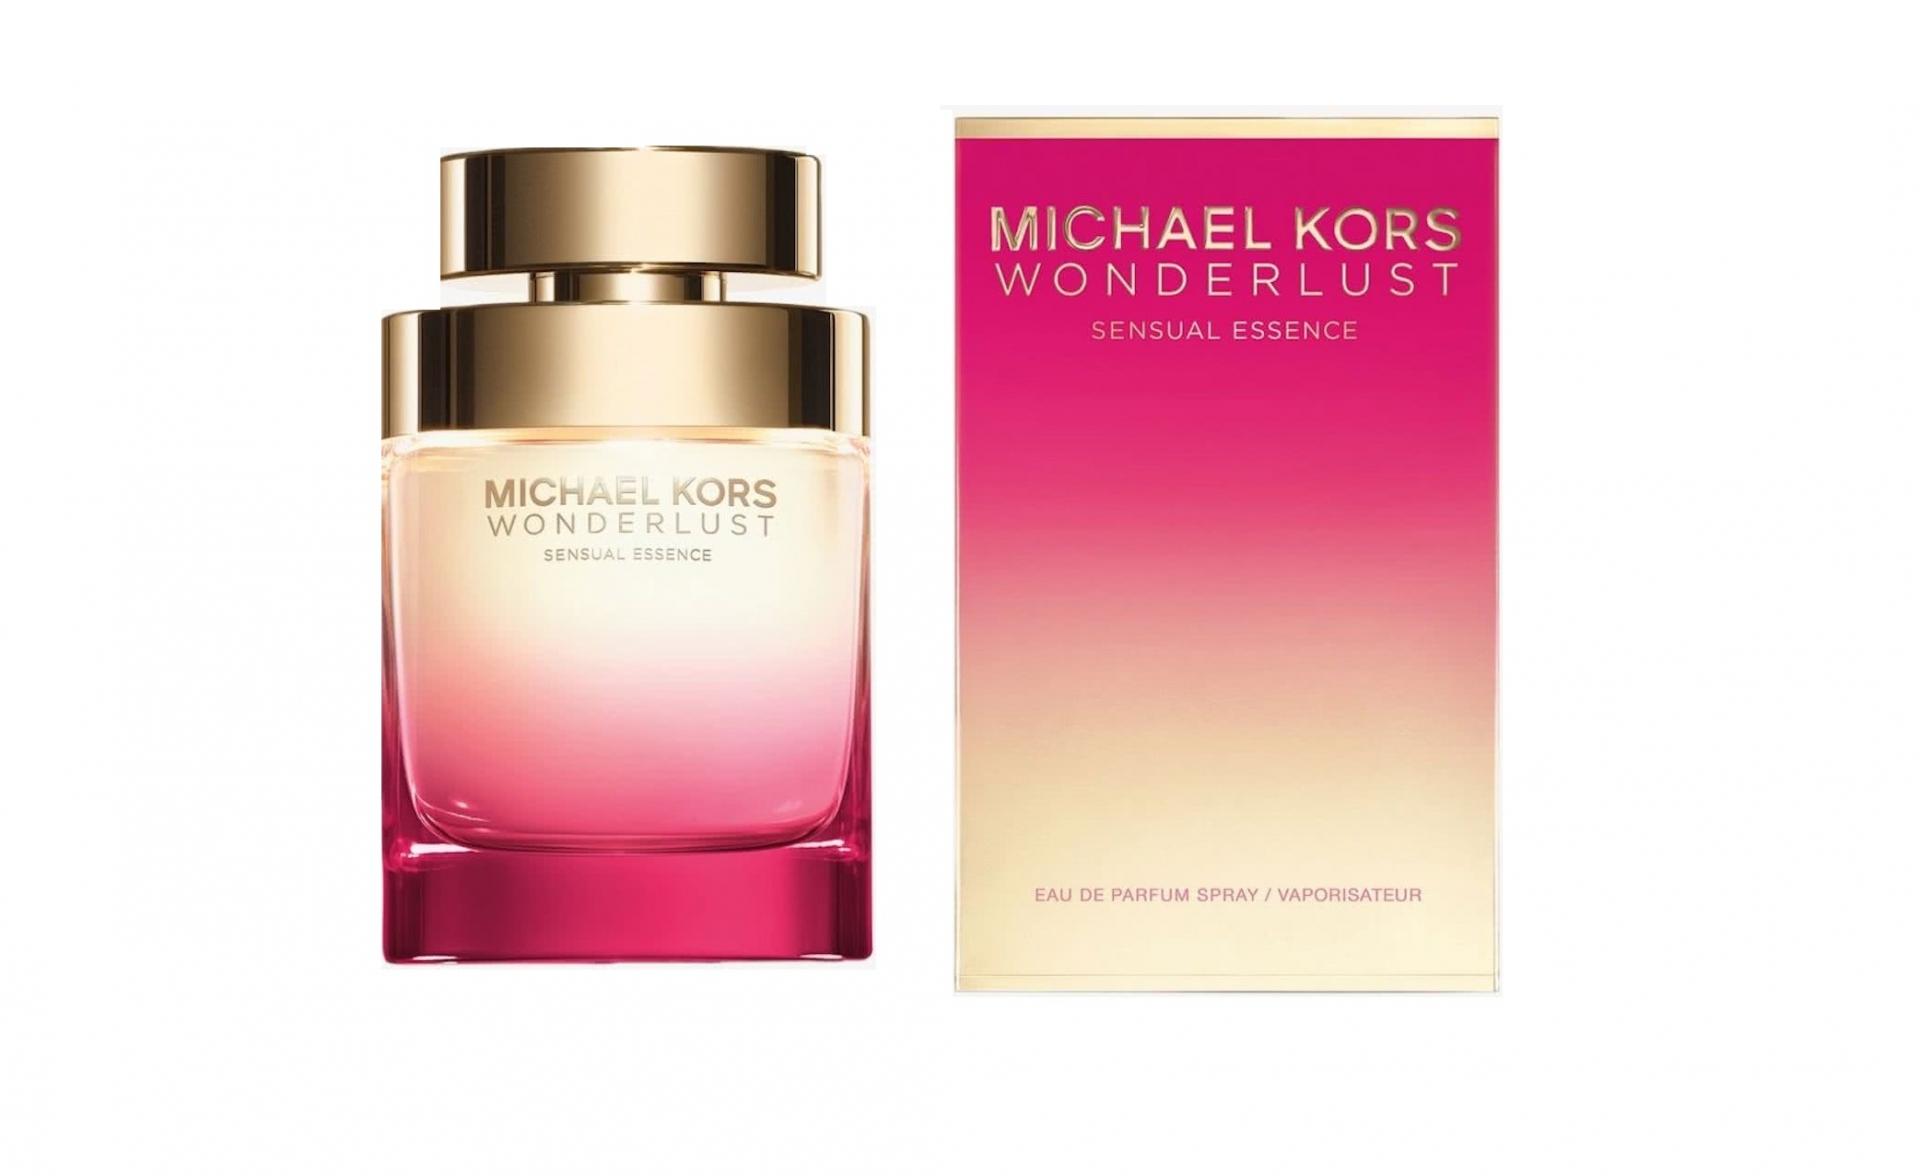 Michael Kors Wonderlust Sensual Essence EDP 30 ml(NEW)